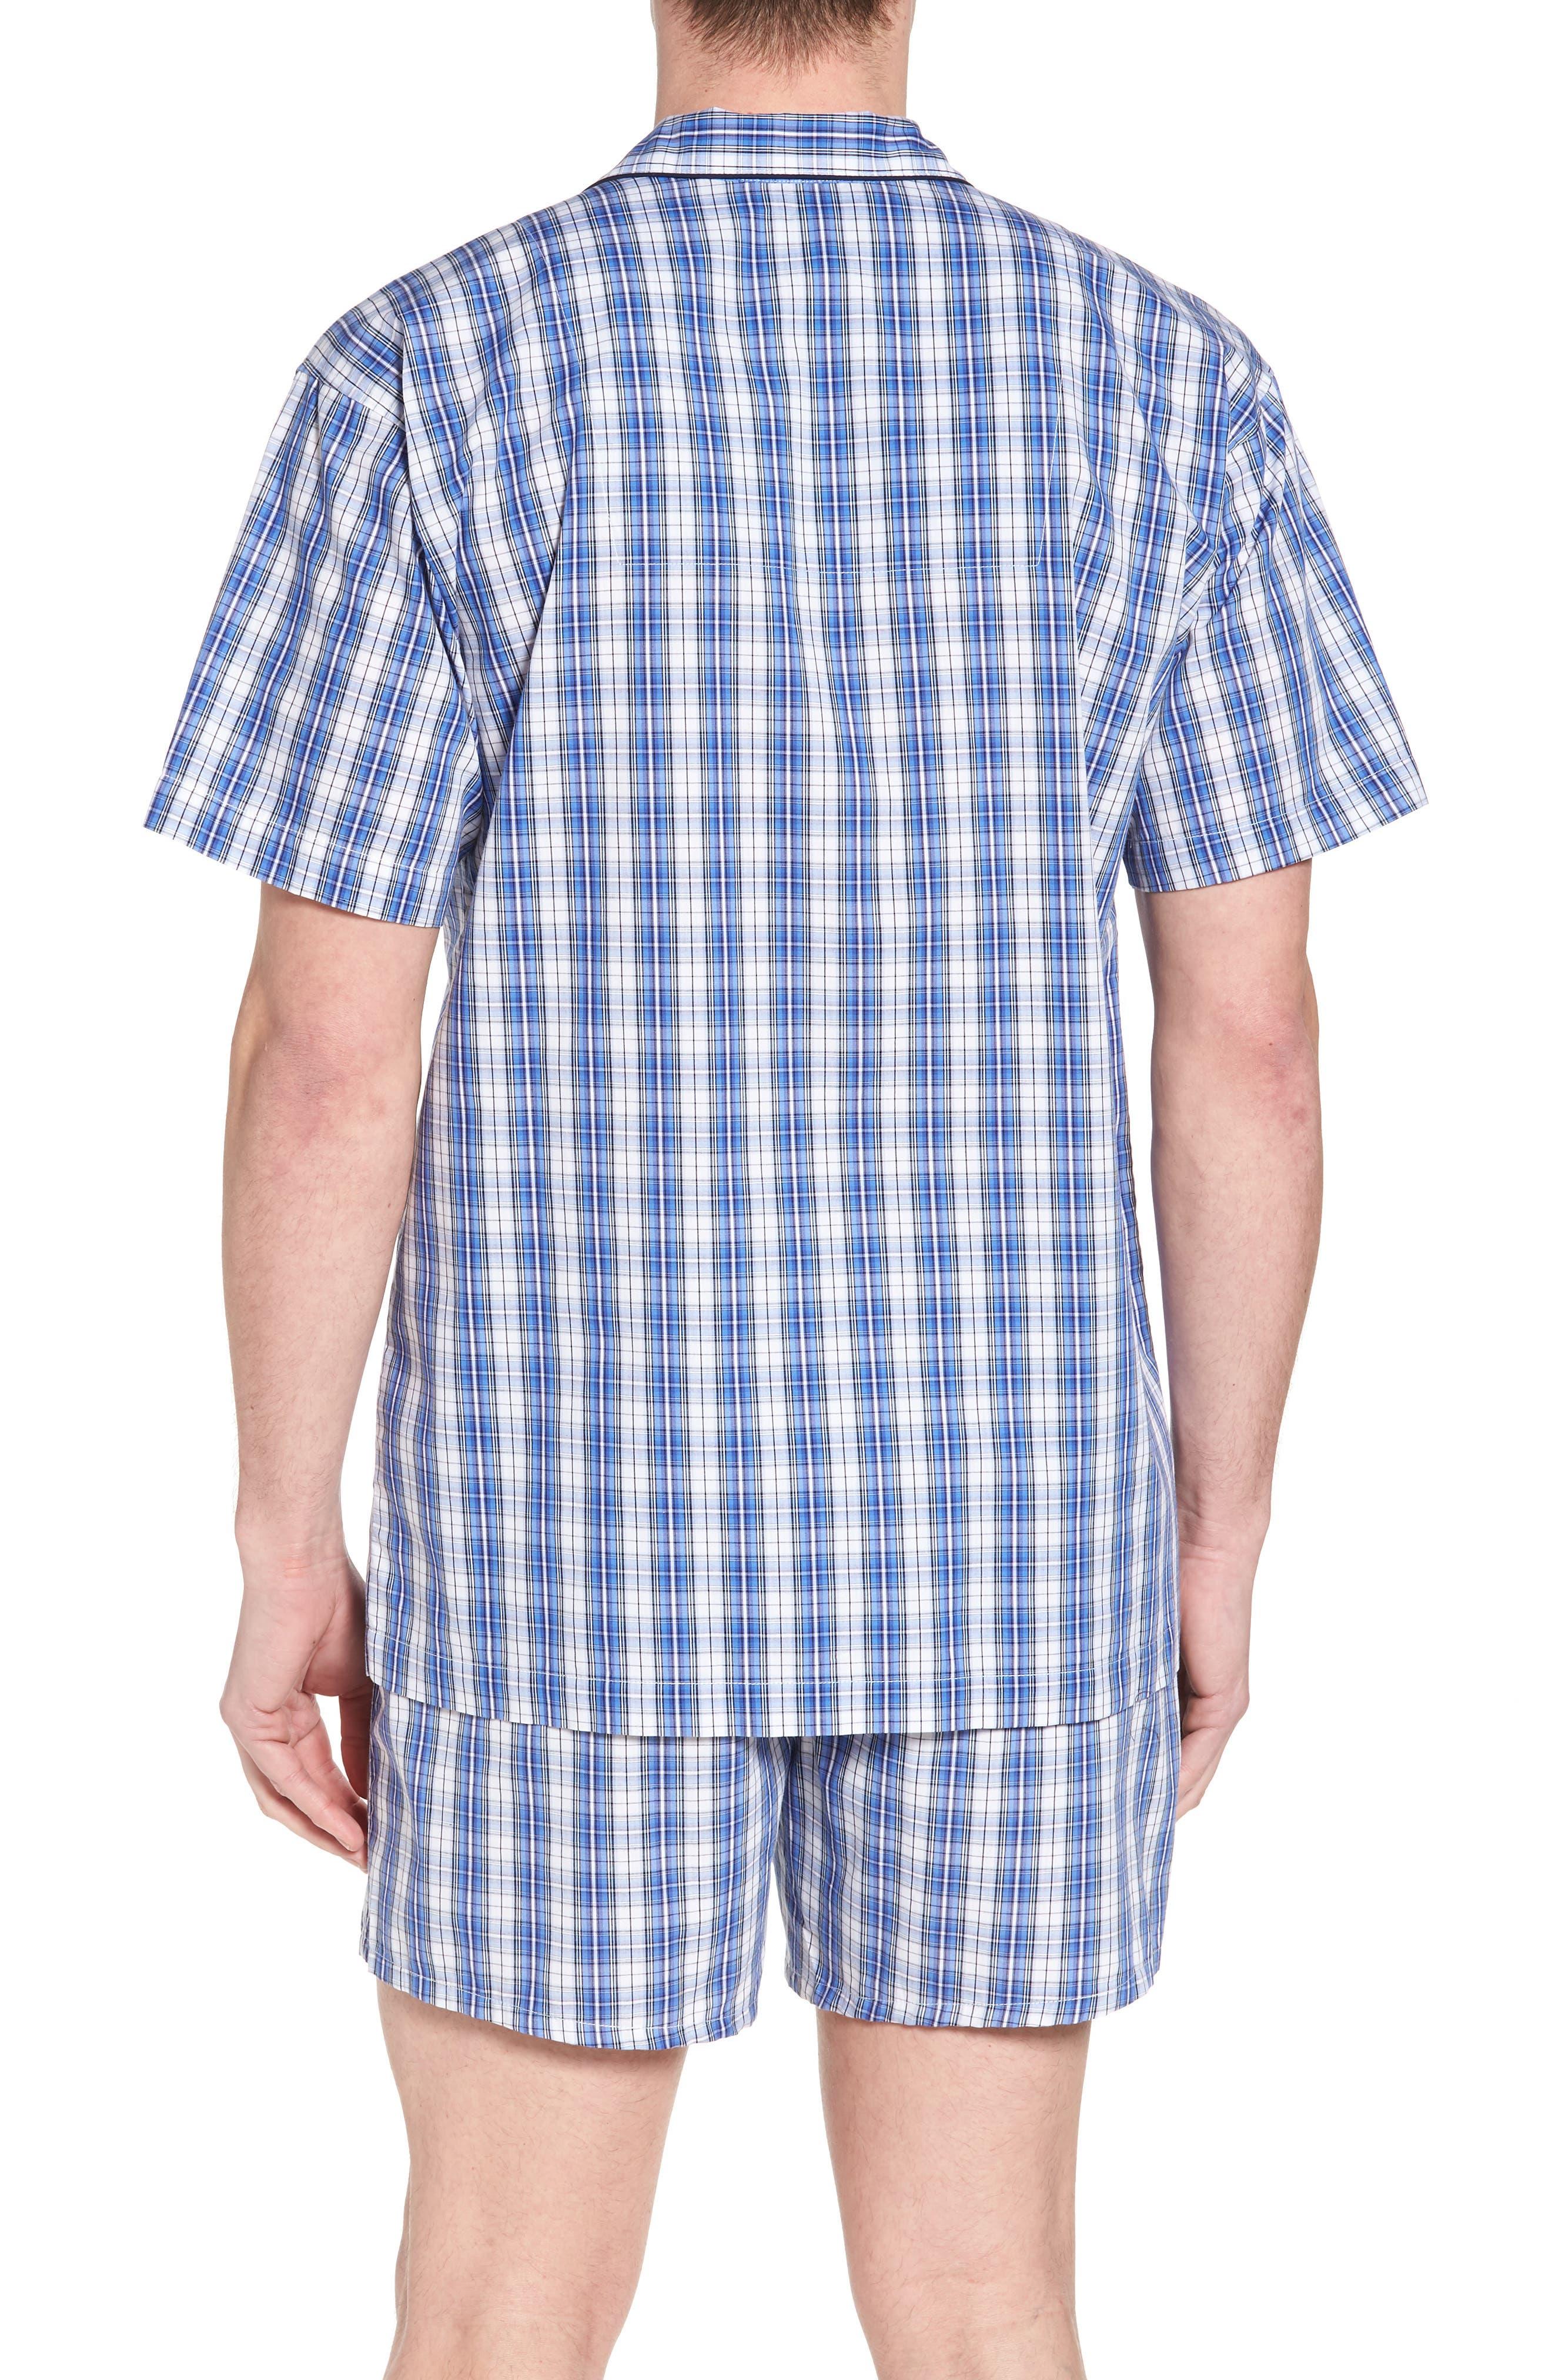 Cotton Pajama Shirt,                             Alternate thumbnail 2, color,                             428